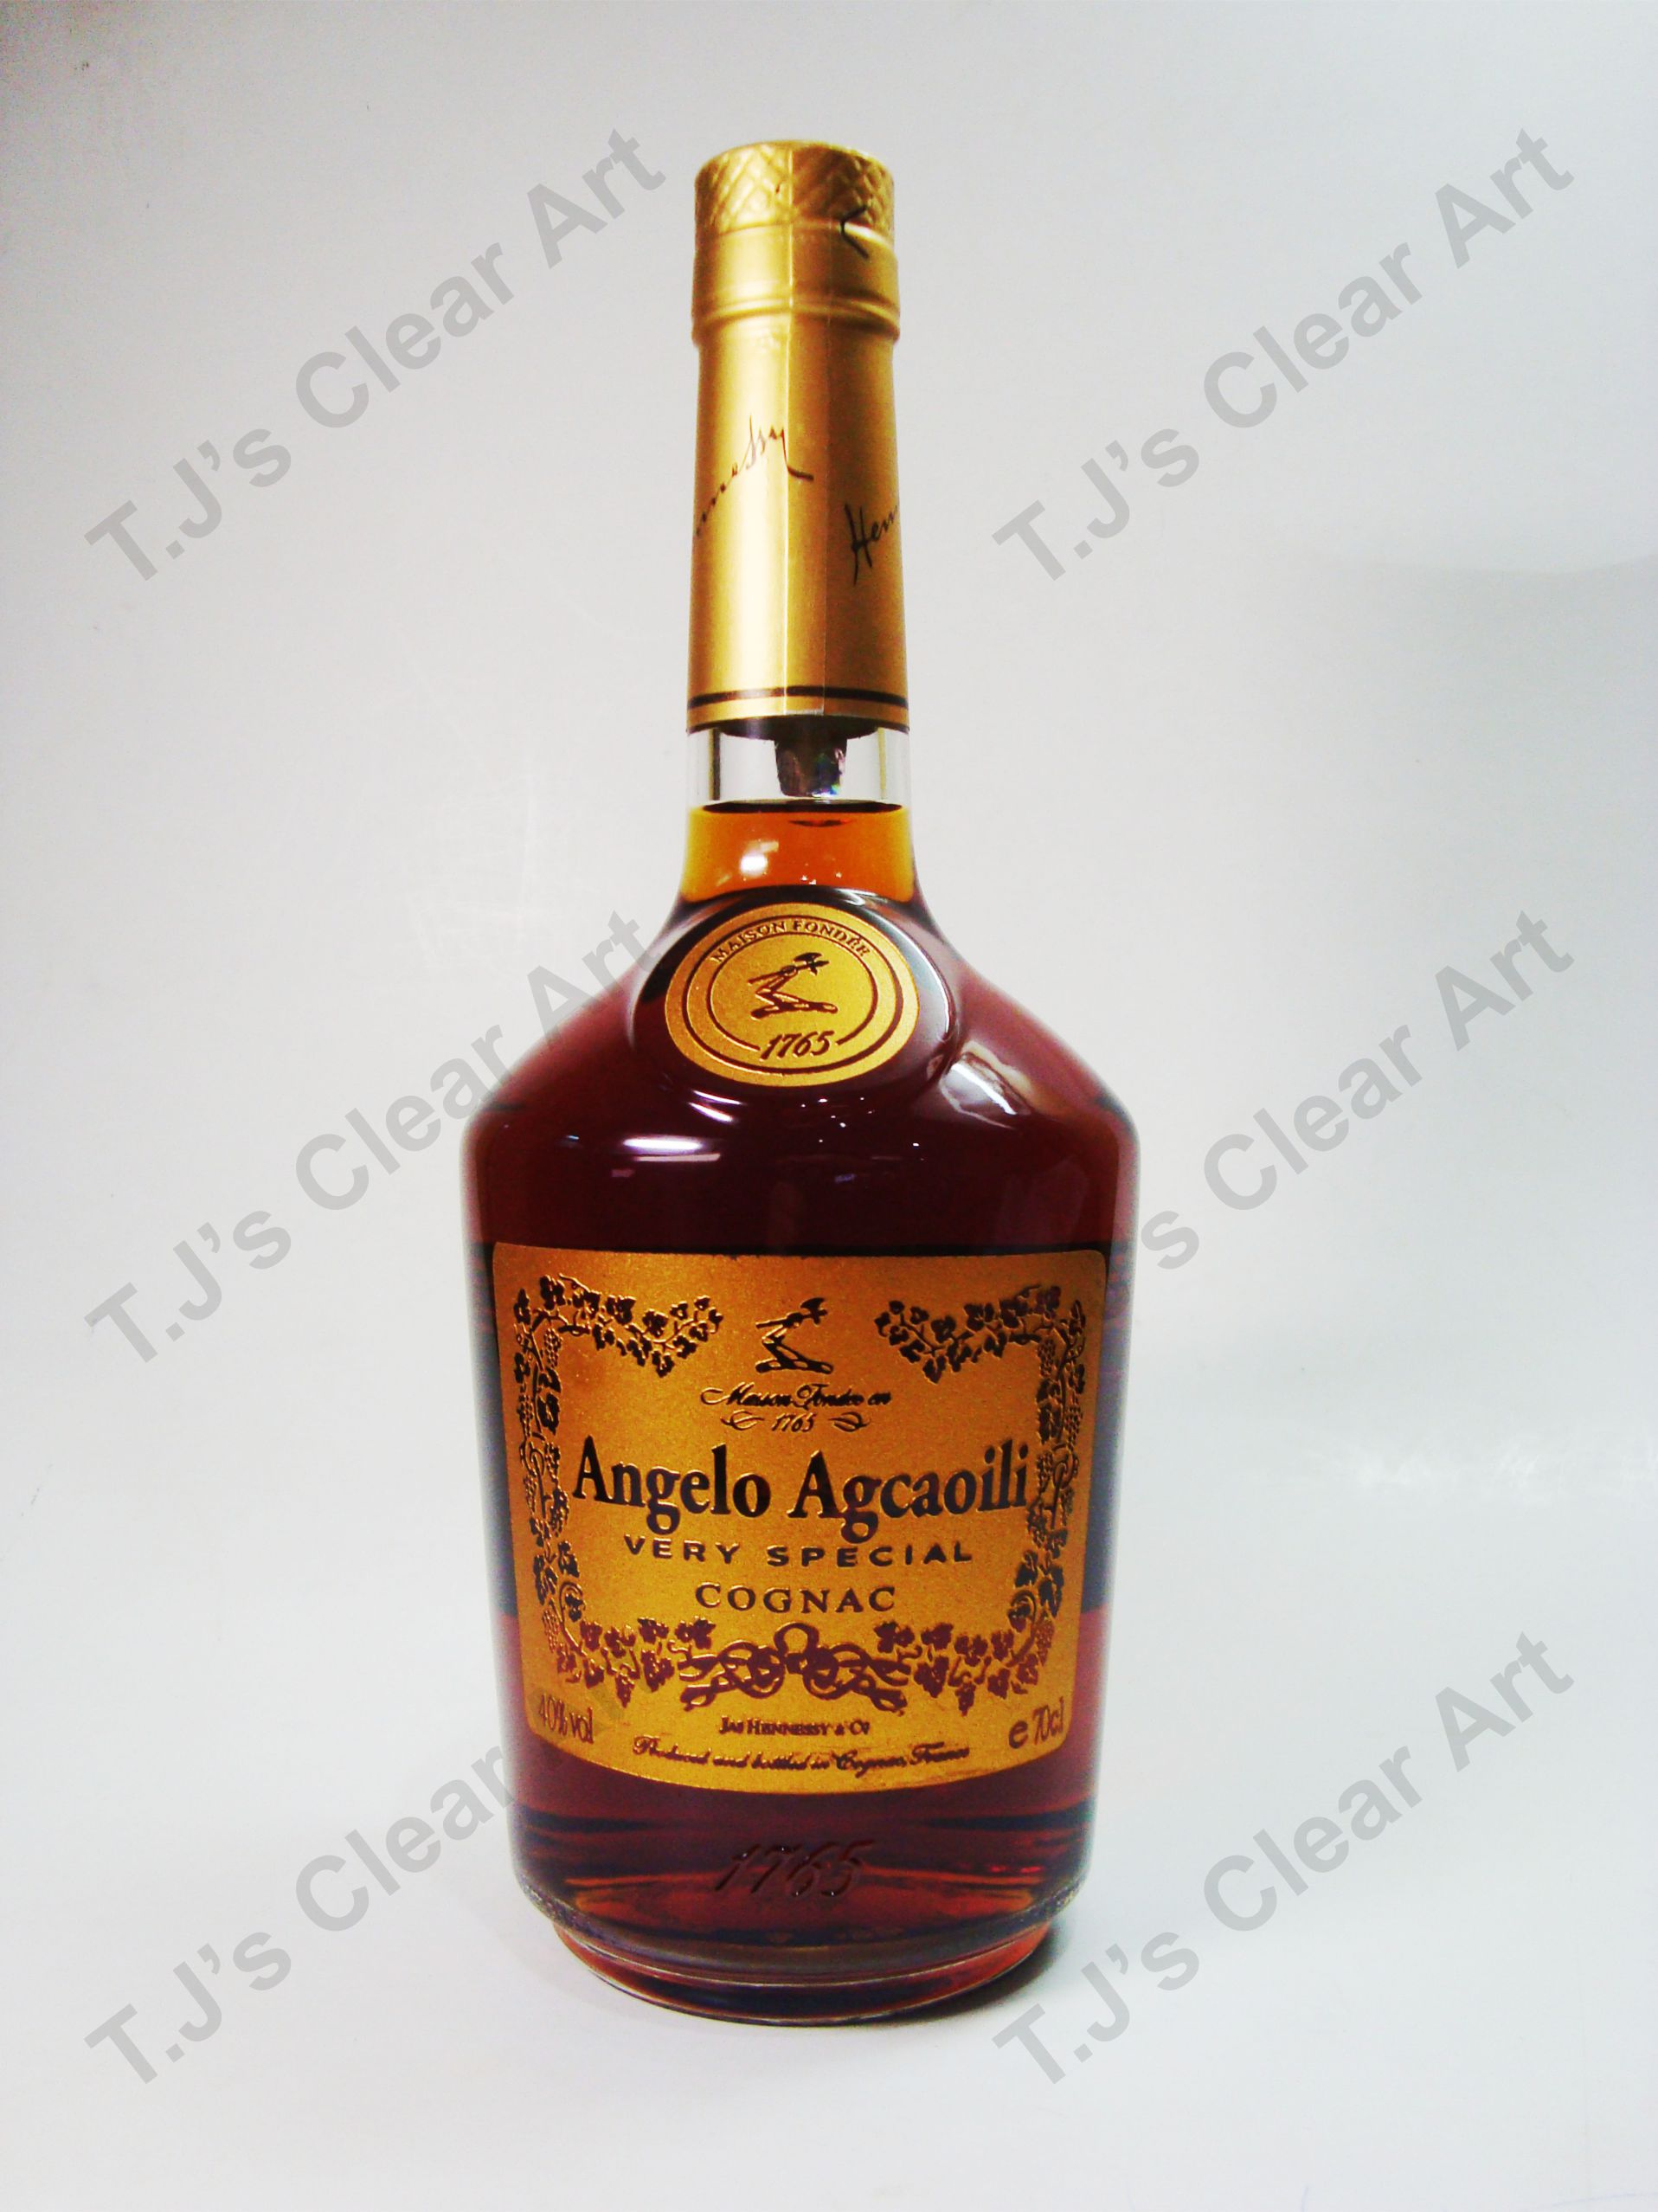 Customized Liquor Bottle